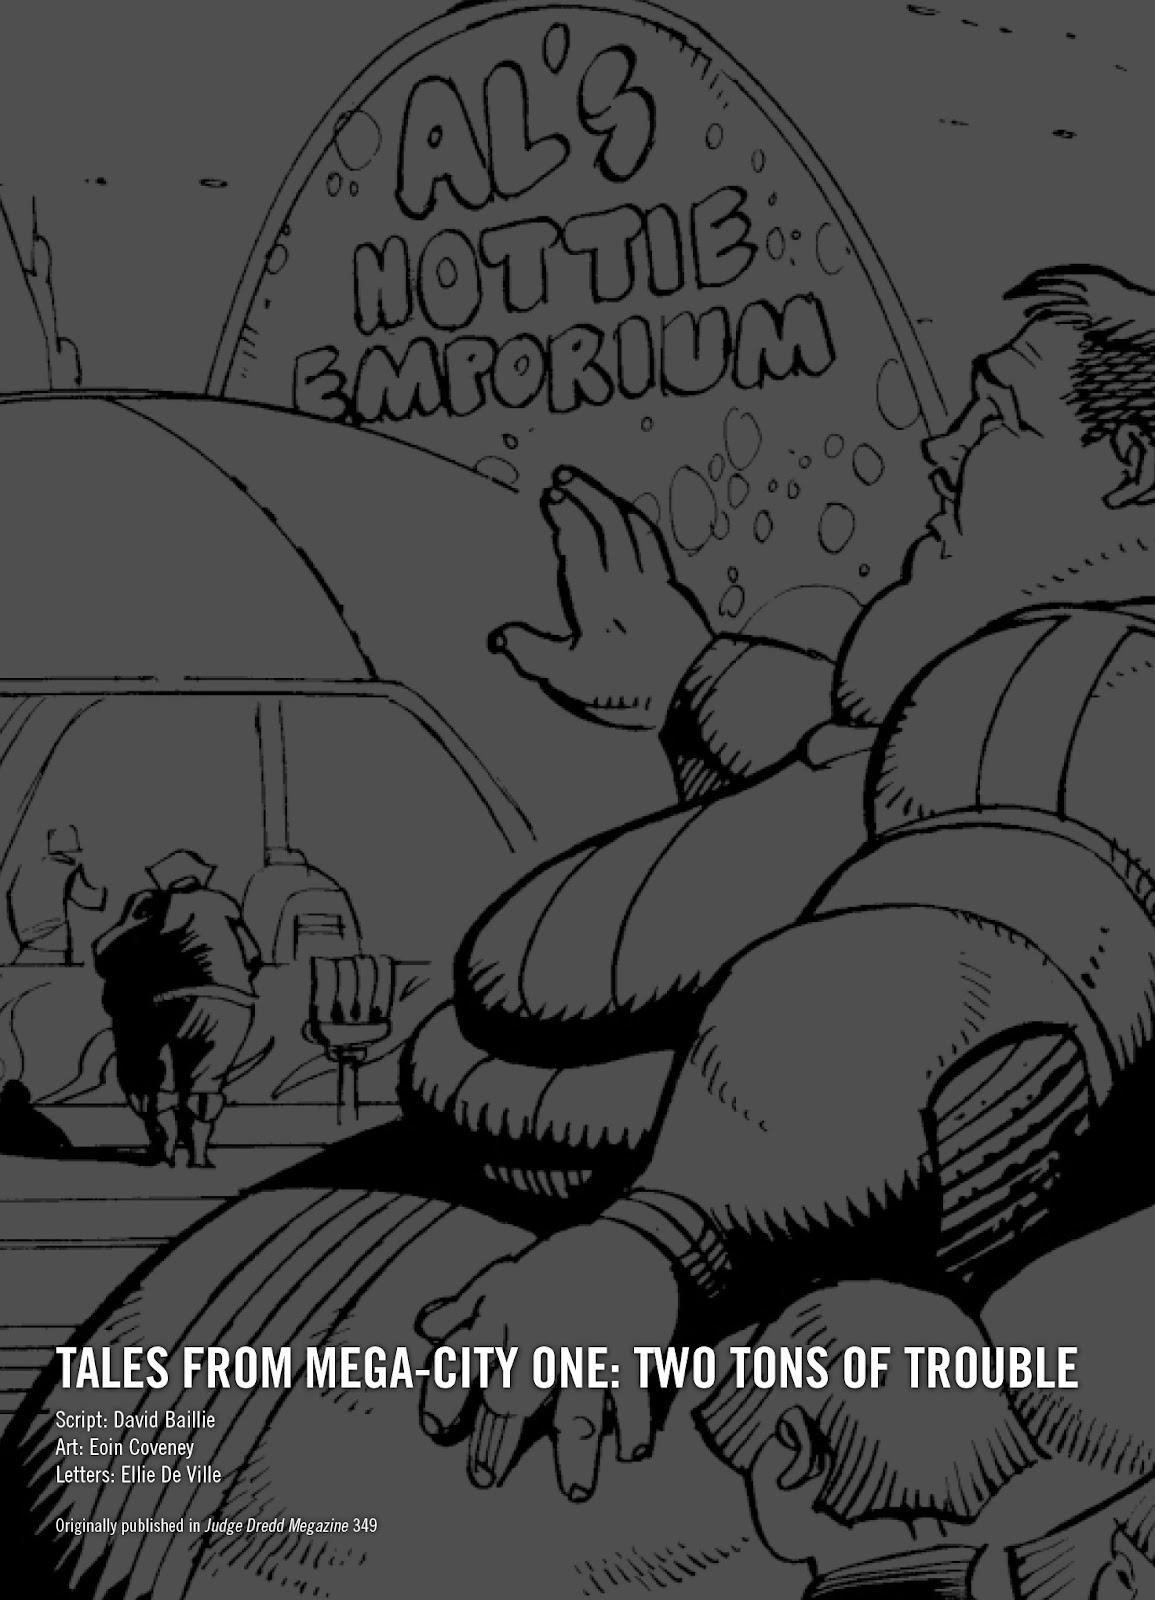 Judge Dredd Megazine (Vol. 5) issue 427 - Page 119